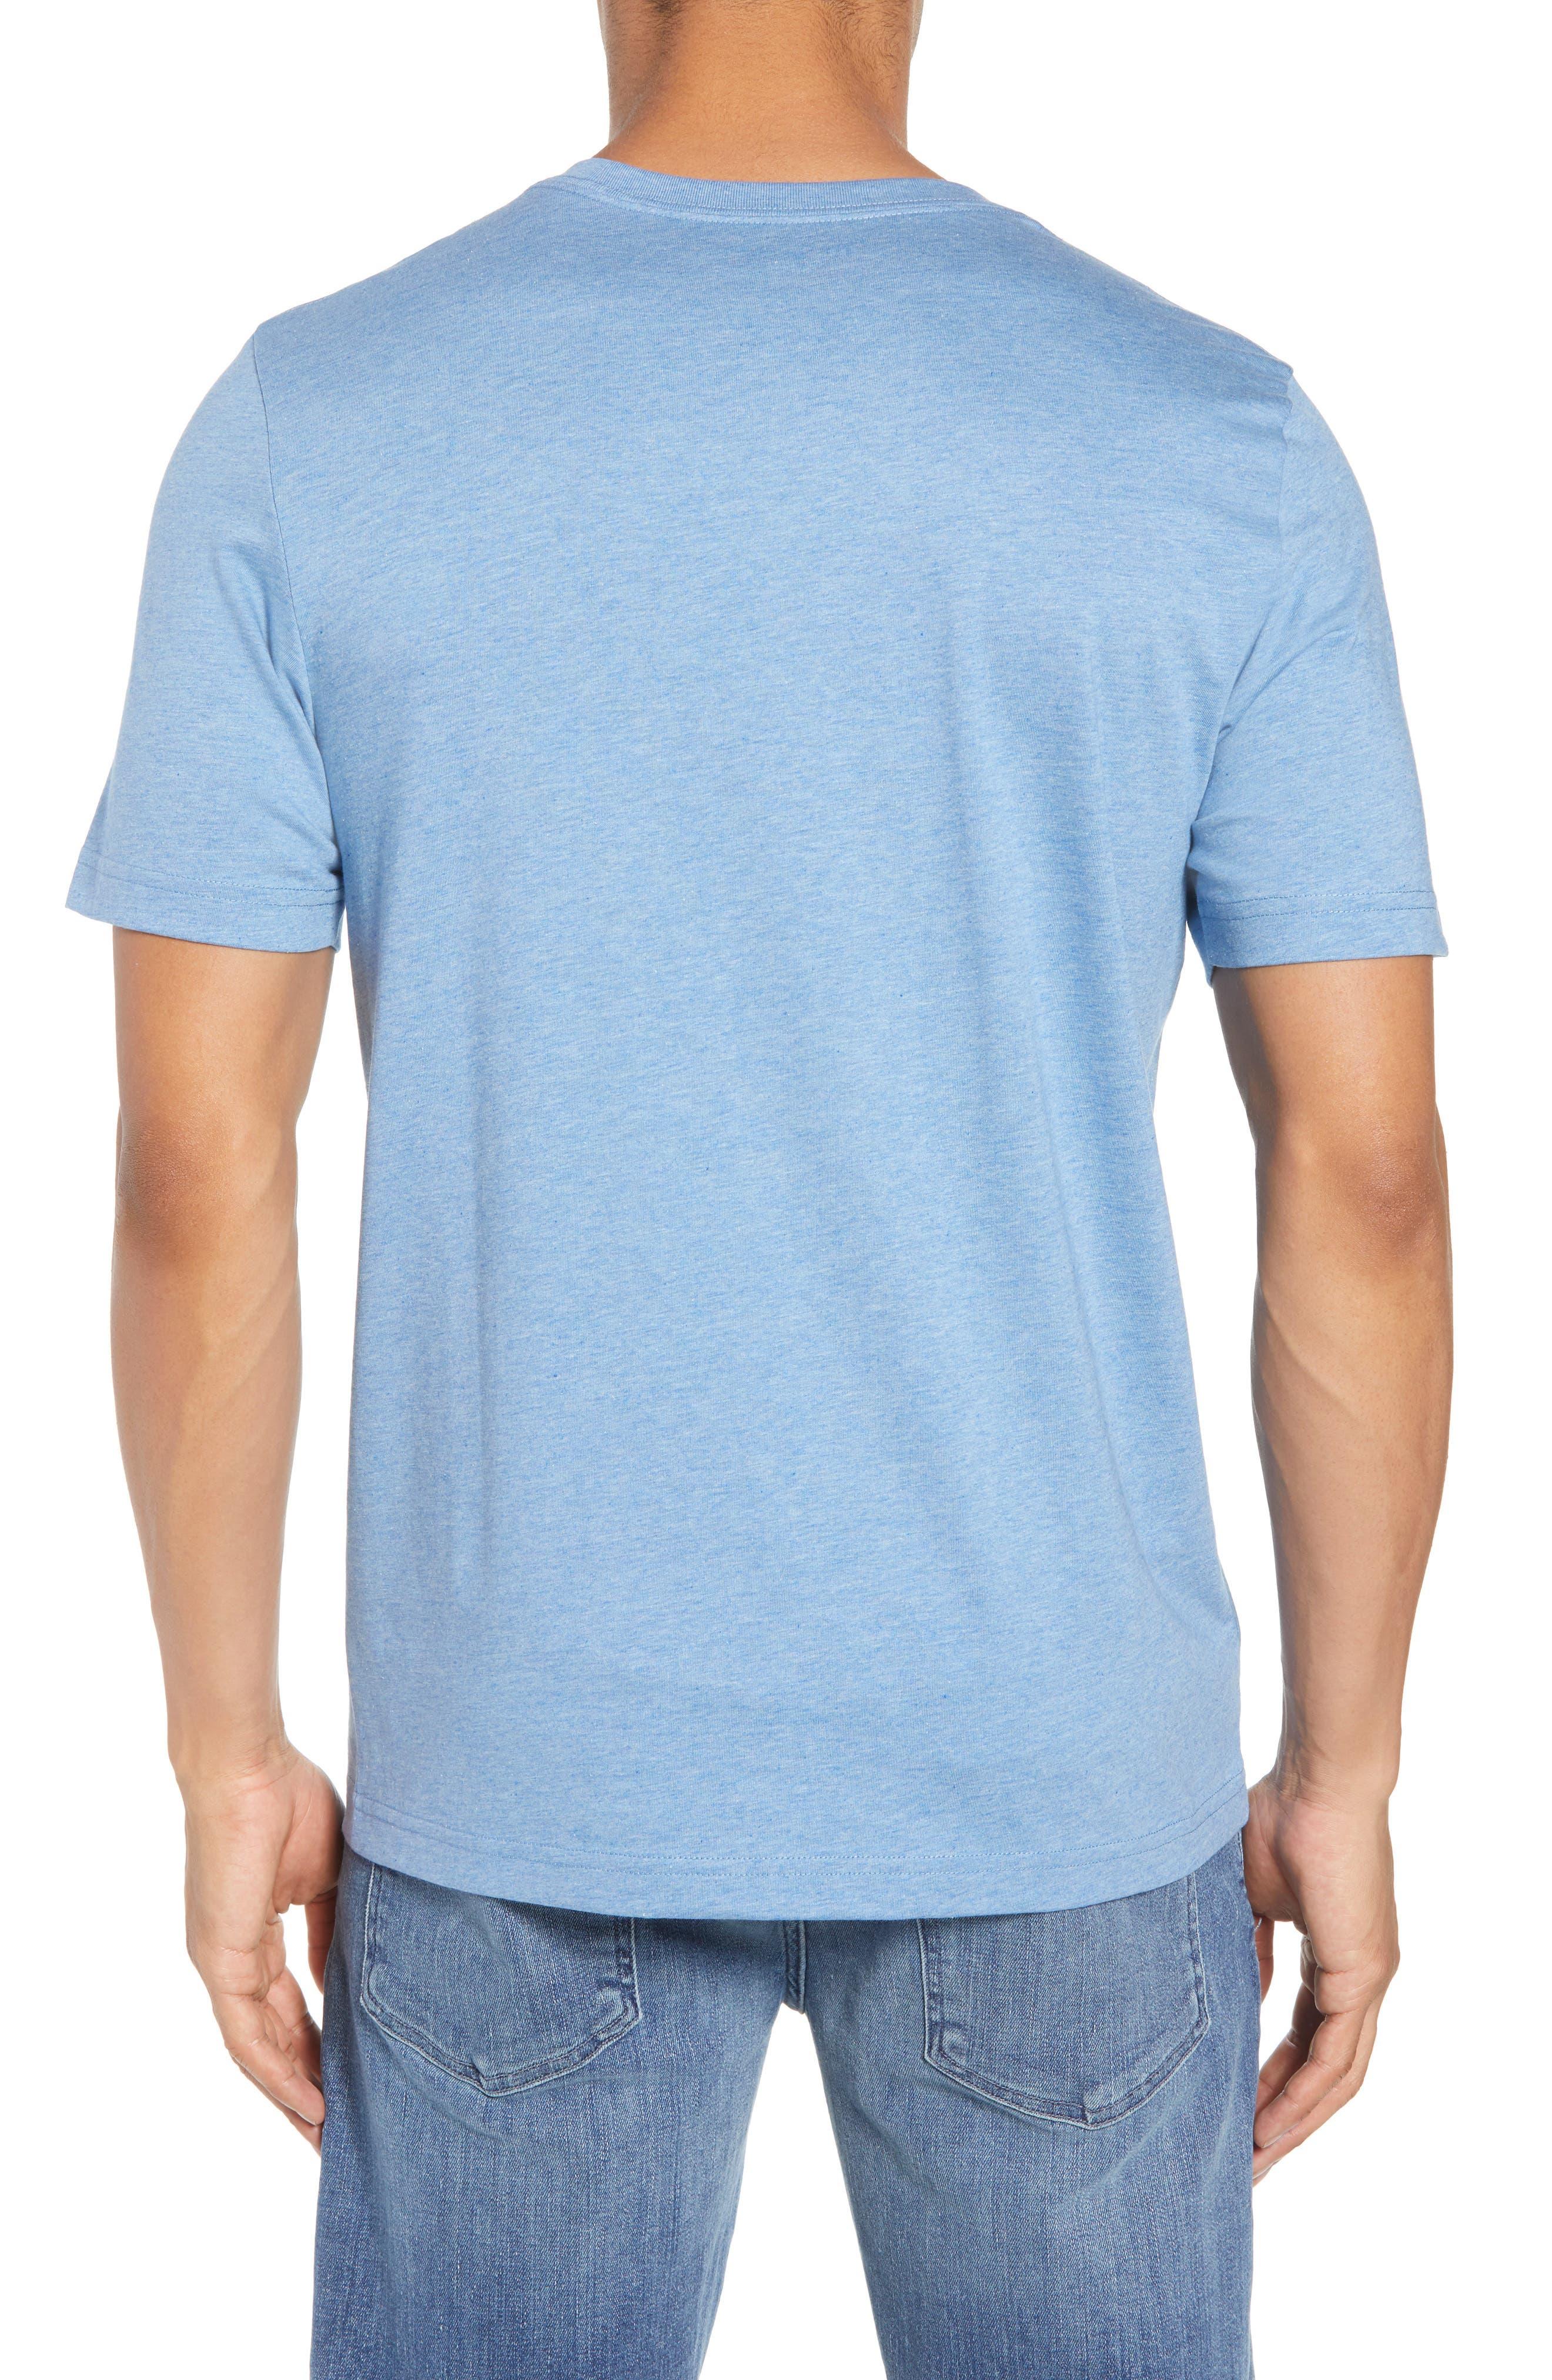 Grand Salami T-Shirt,                             Alternate thumbnail 2, color,                             Heather Blue